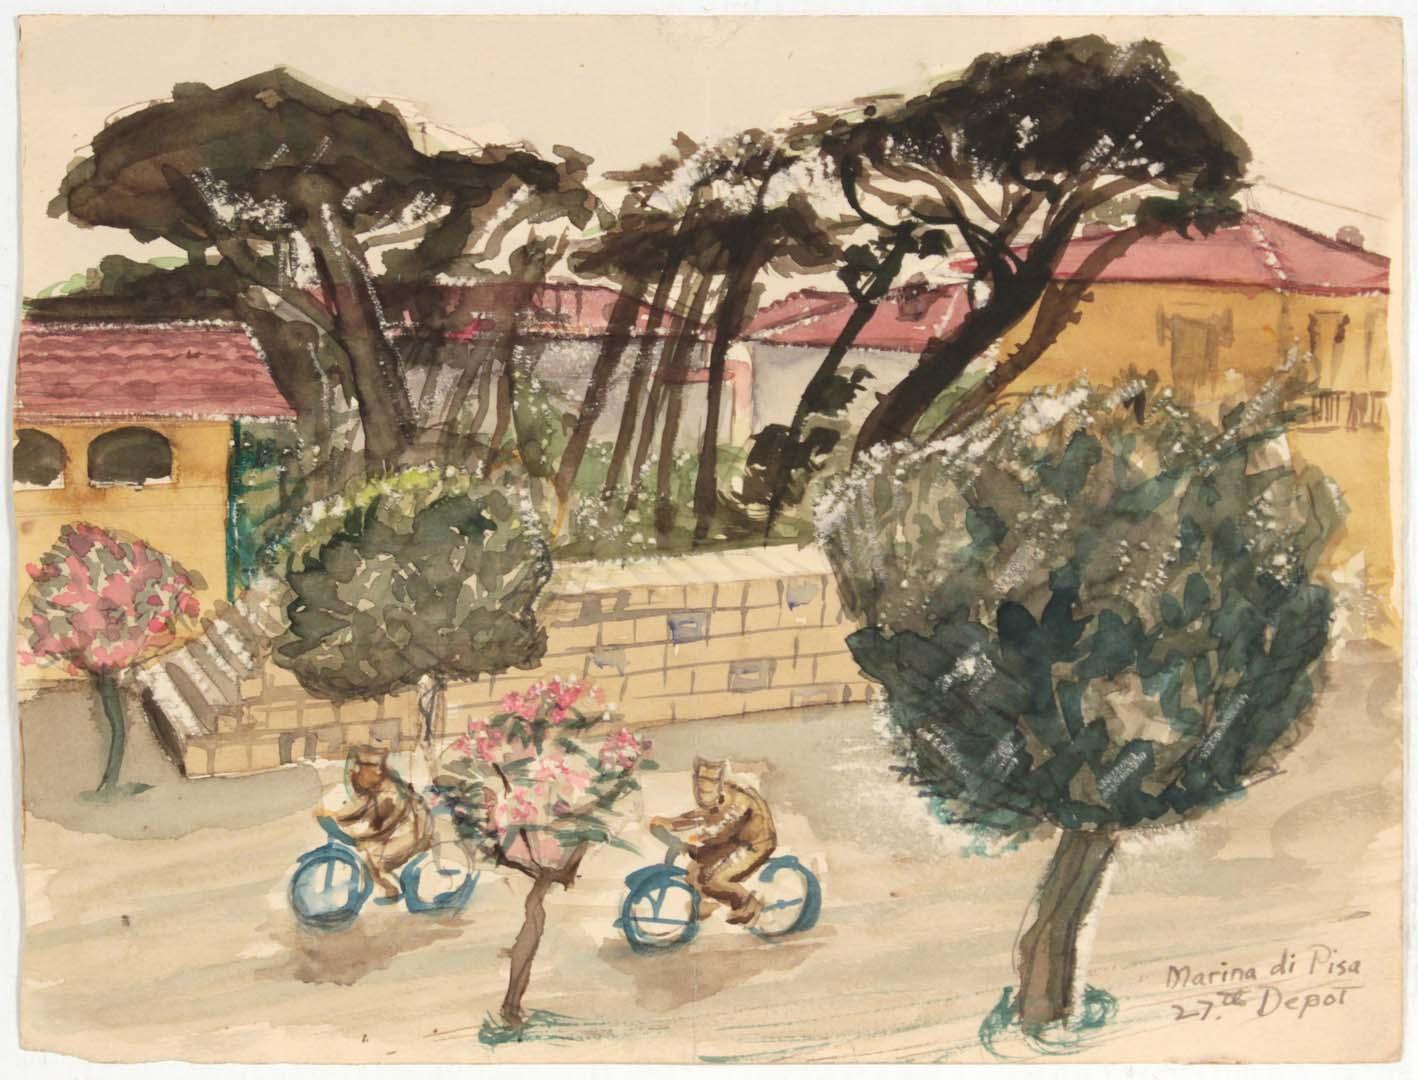 1945 Marina Di Pisa IV 27th Depot Watercolor 6.9375 x 9.125